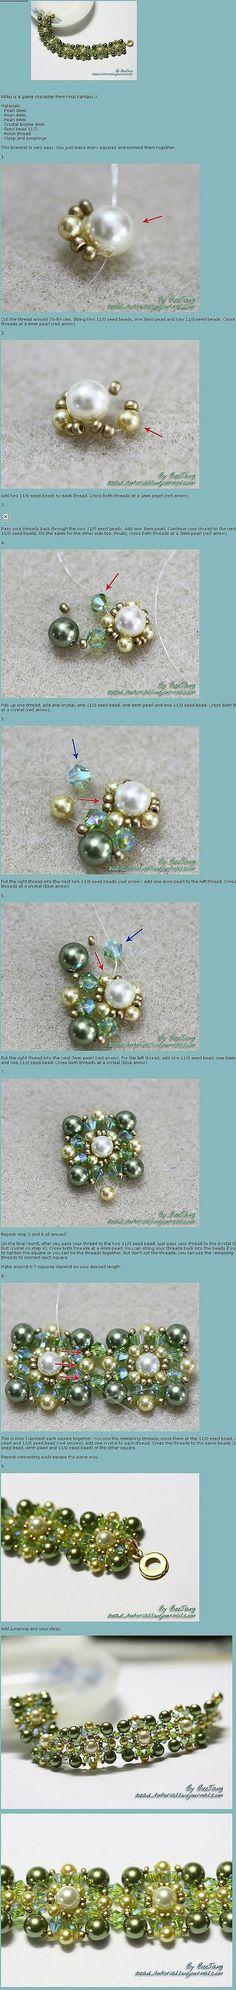 bracelet making, pattern, photo tutorial, diy tutorial, pearl bracelets, beaded bracelets, seed beads, diy bracelet, bead crafts